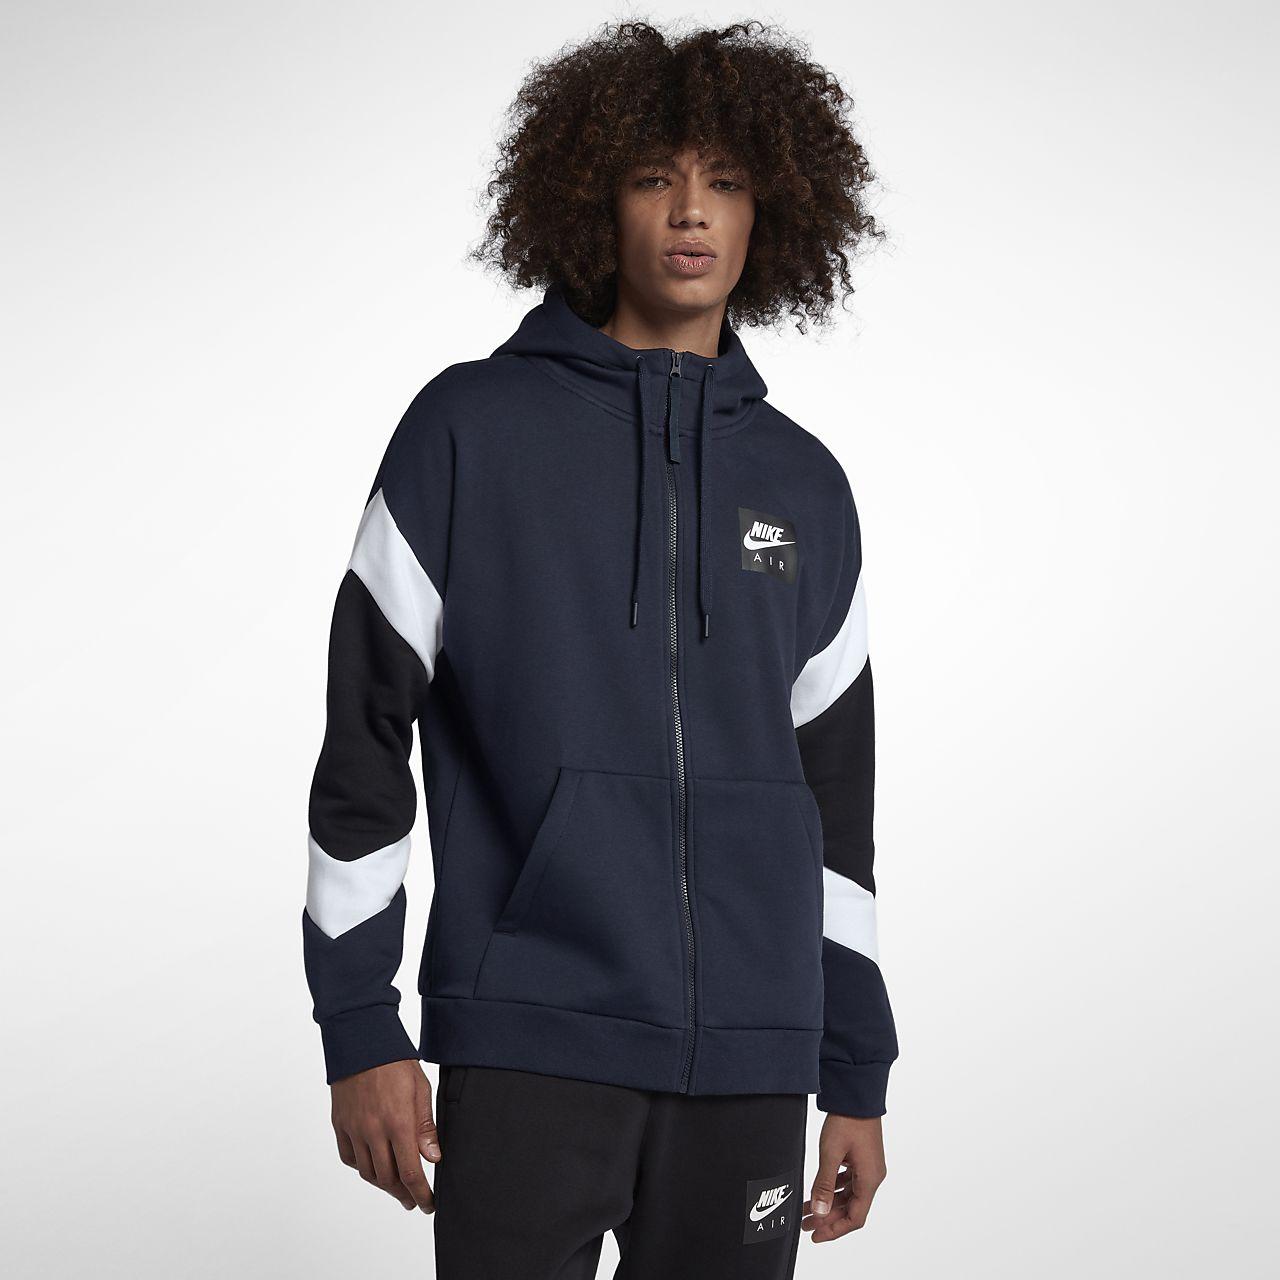 1a182198f882 Nike Sportswear Air Men s Full-Zip Hoodie. Nike.com GB